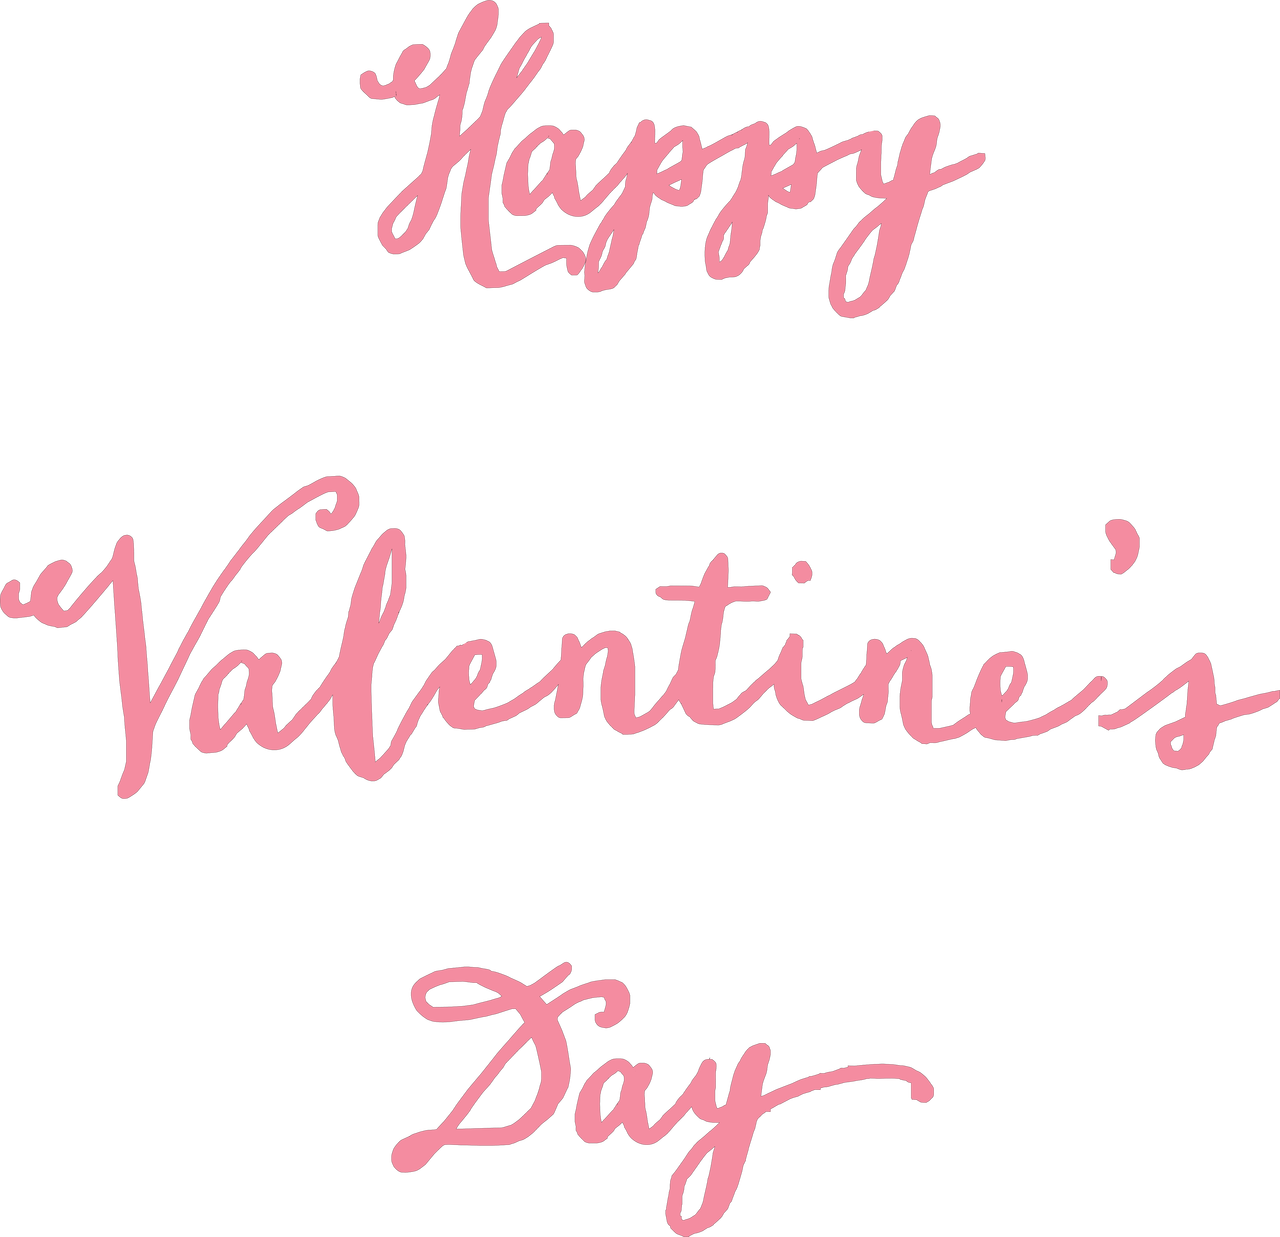 Happy Valentine's Day #3 SVG Cut File